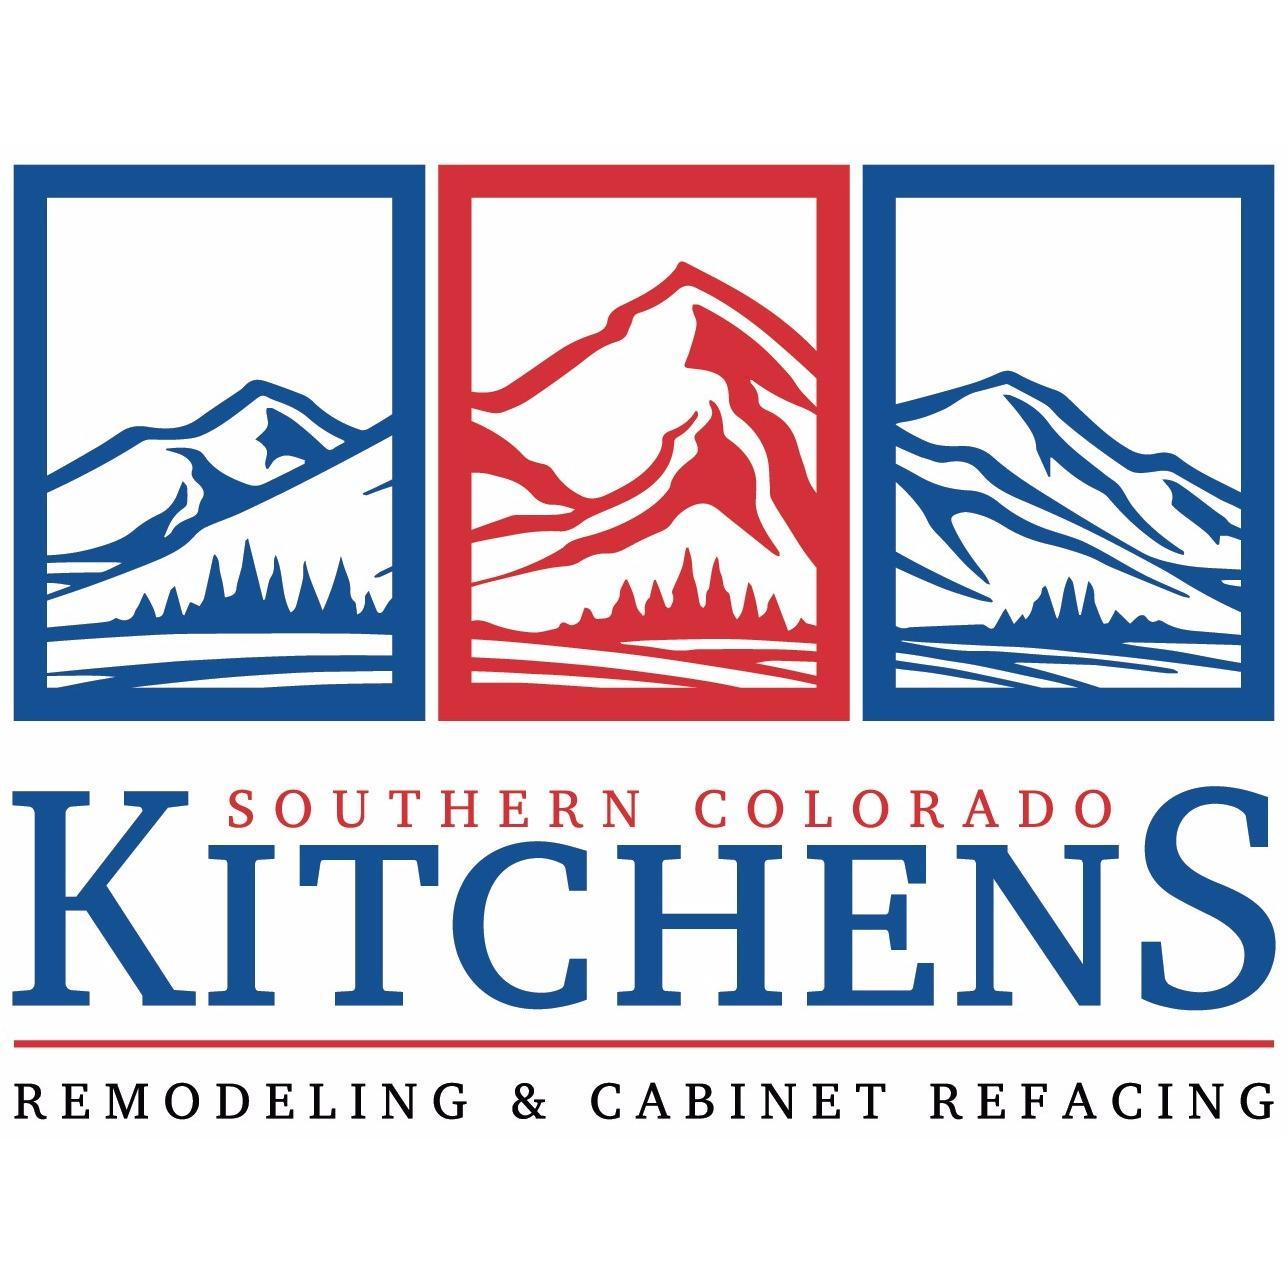 Southern Colorado Kitchens